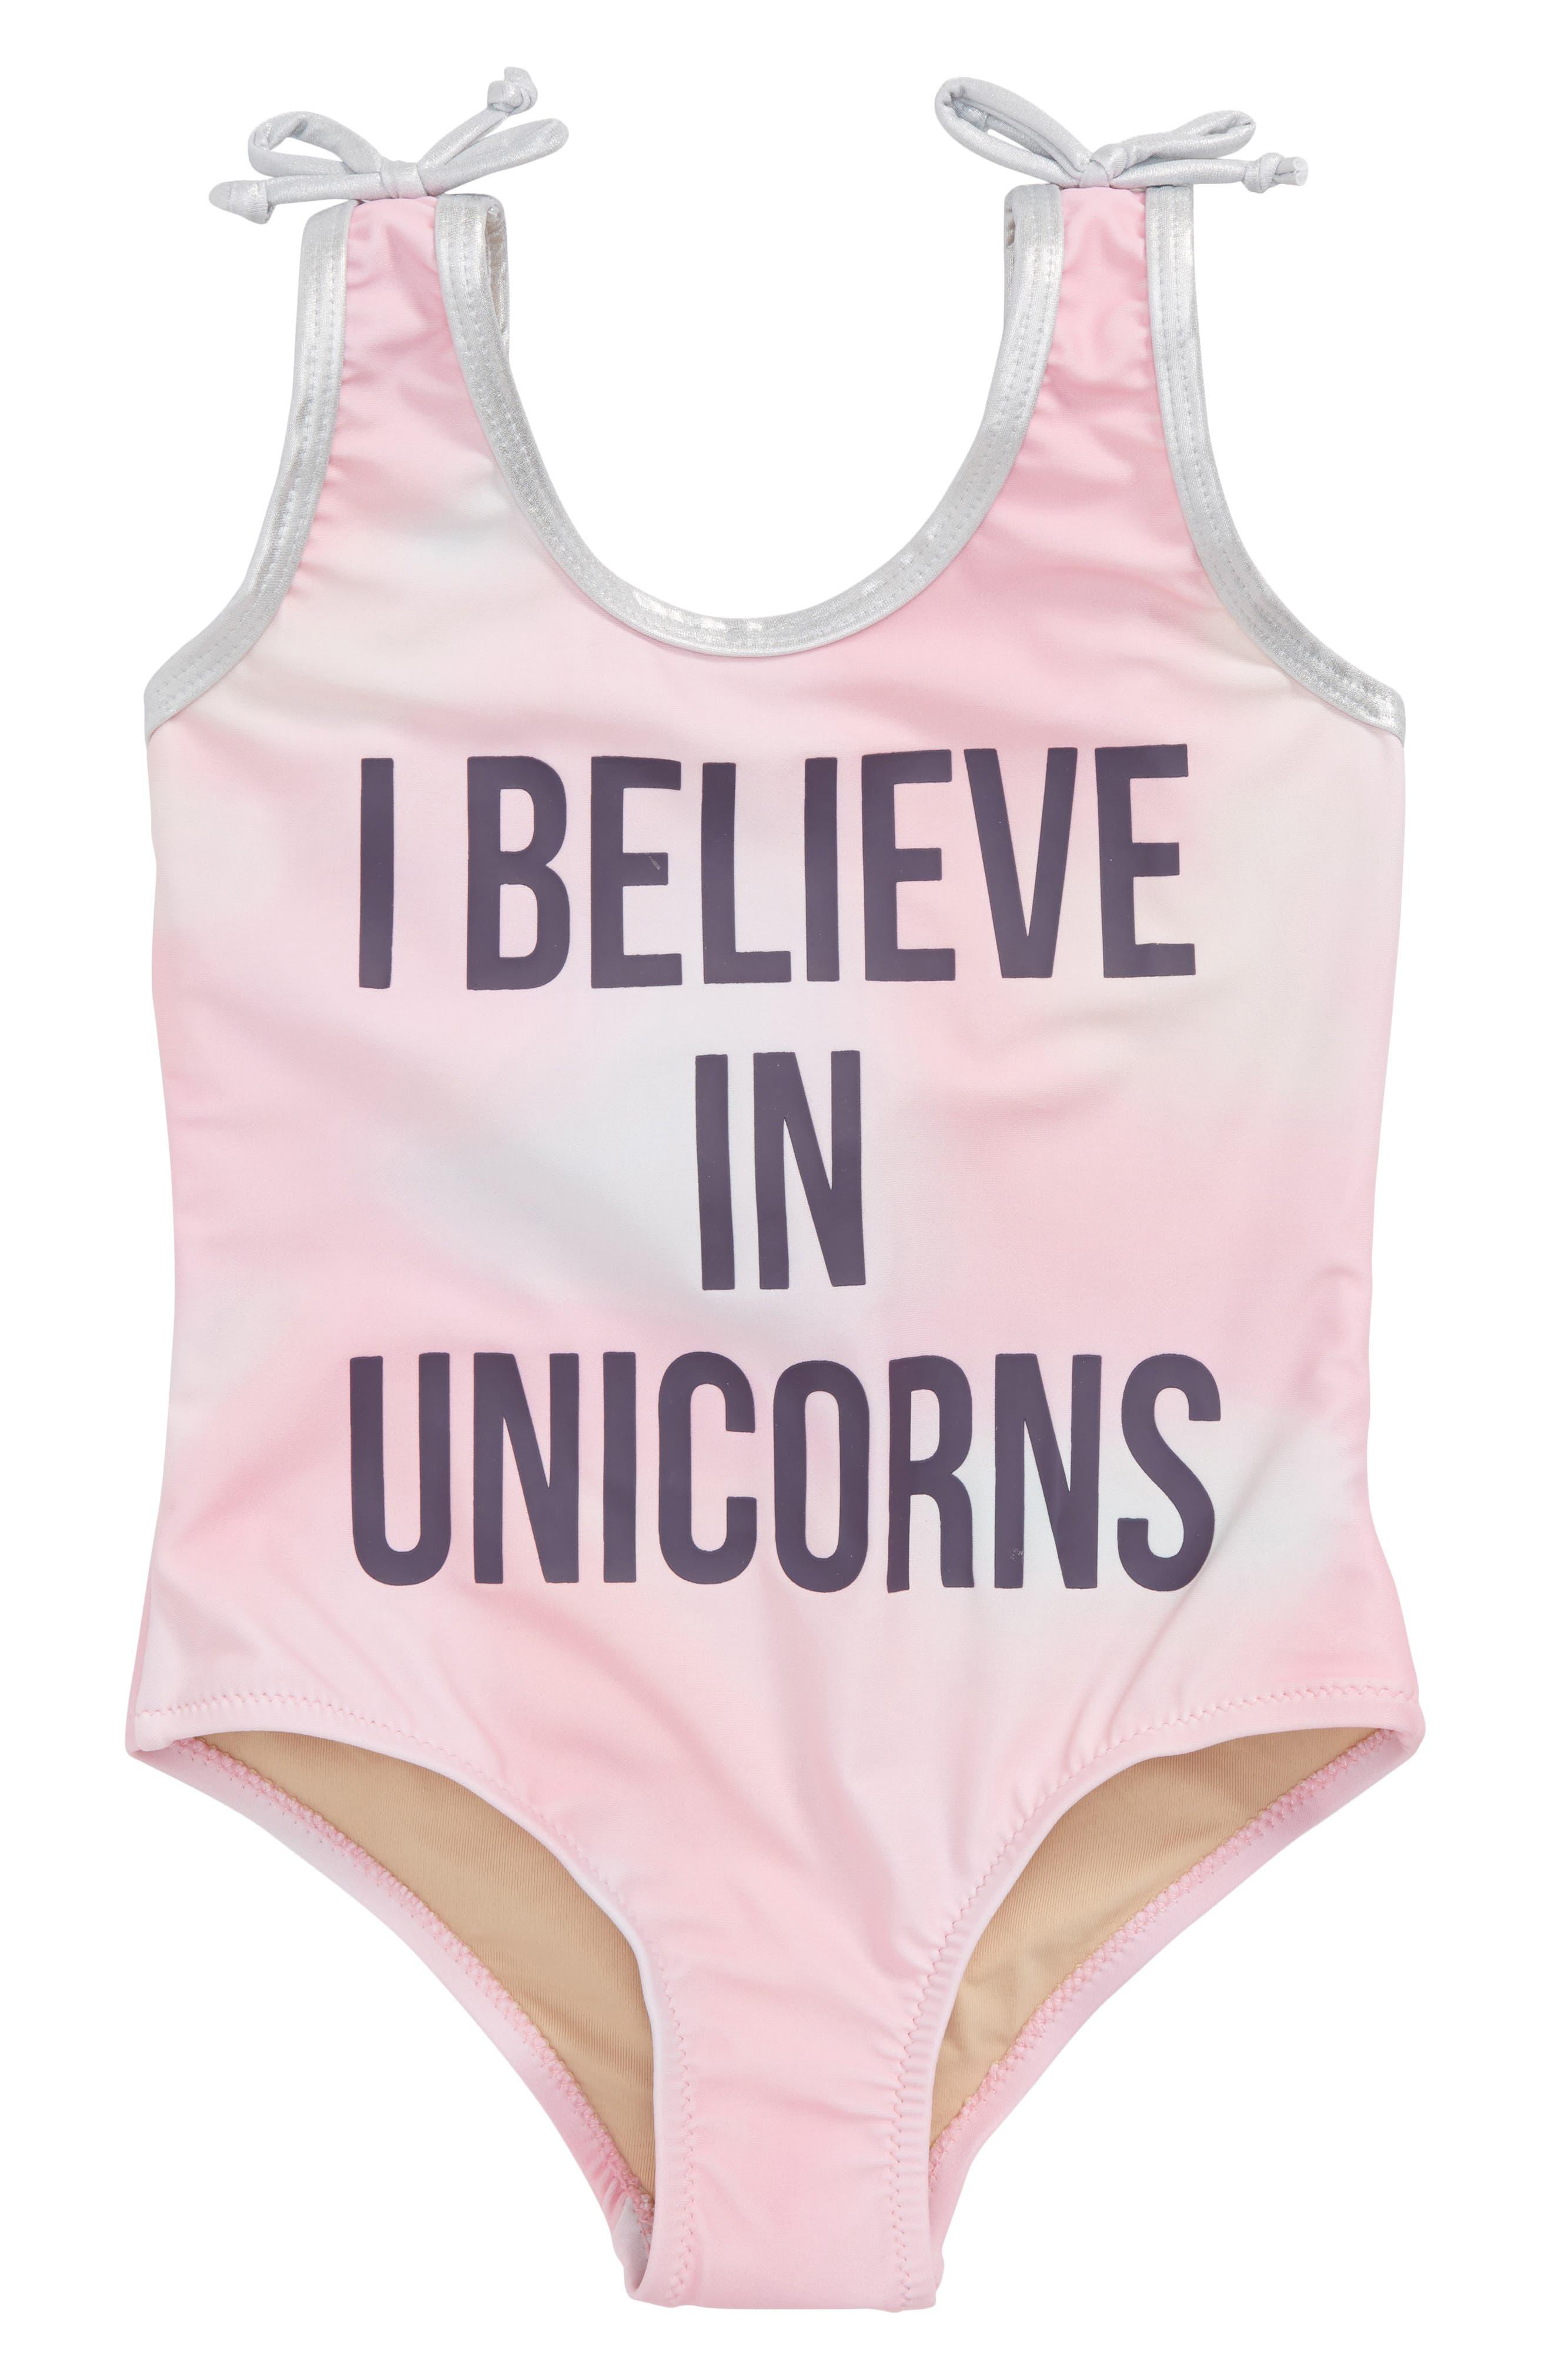 I Believe in Unicorns Tie Dye One-Piece Swimsuit,                             Main thumbnail 1, color,                             650